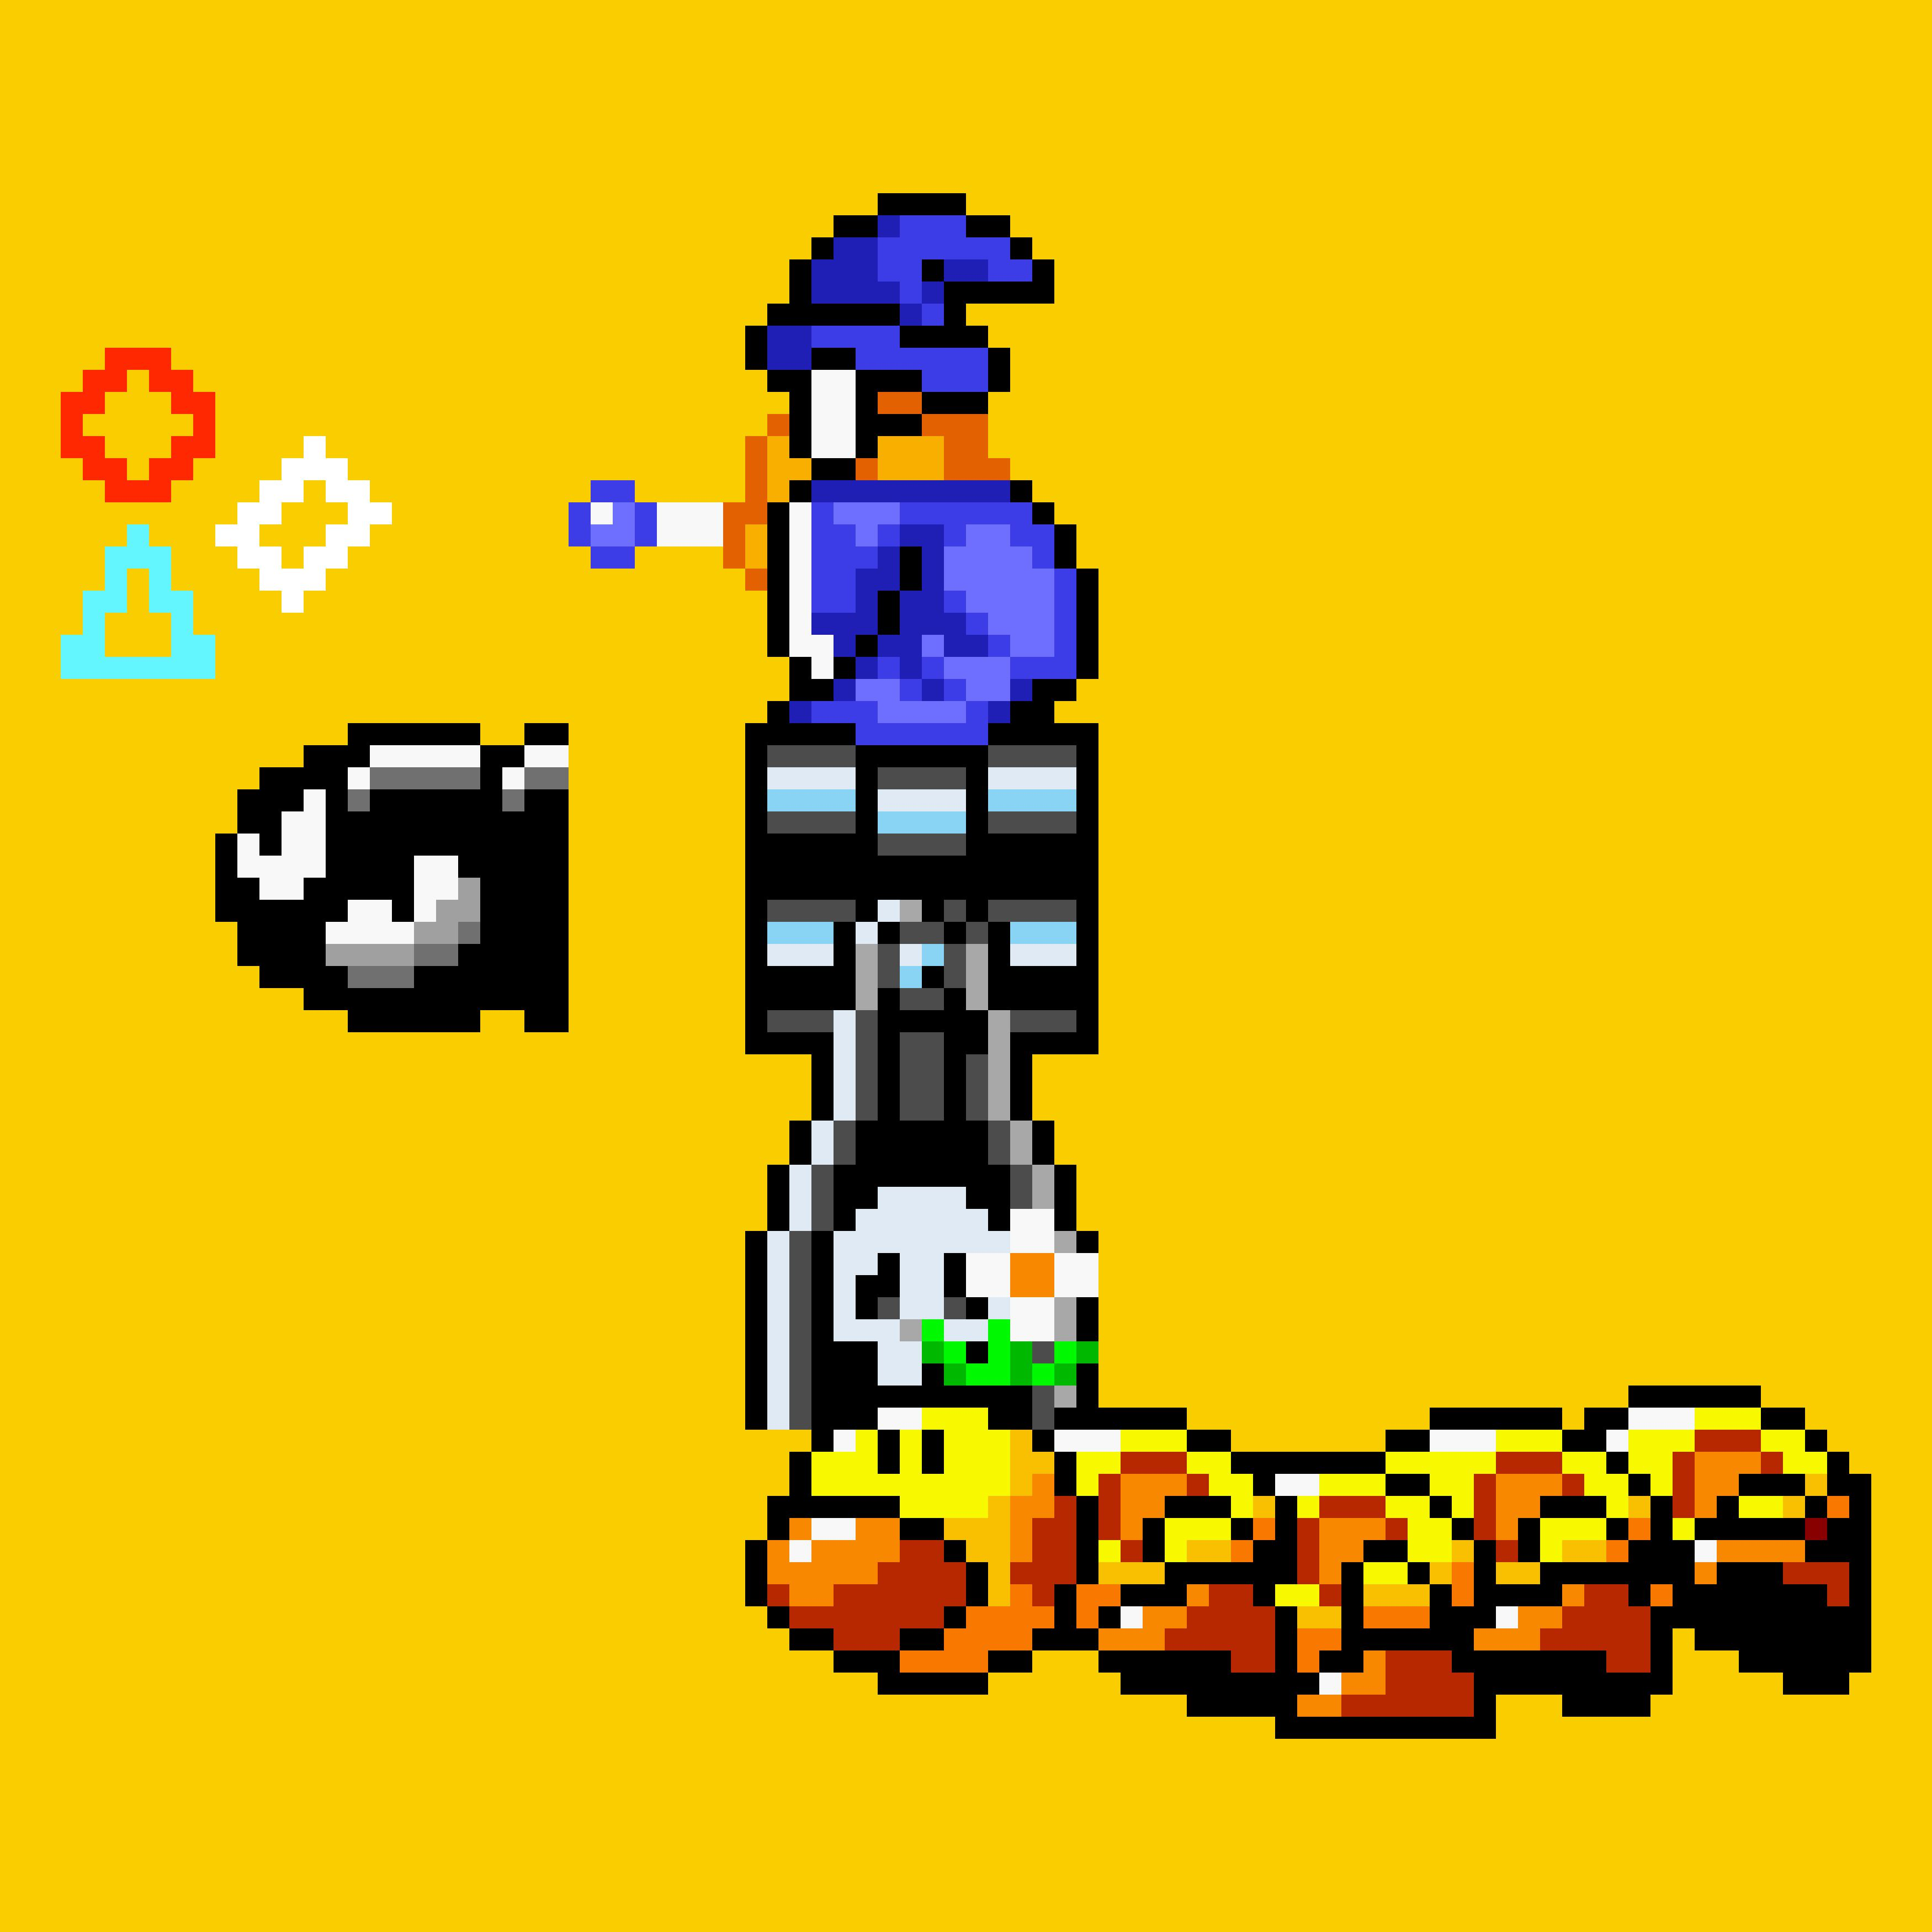 Squishy Super Mario Maker 1 : Super Mario Maker: trailer, screenshots, artworks, more - Perfectly Nintendo